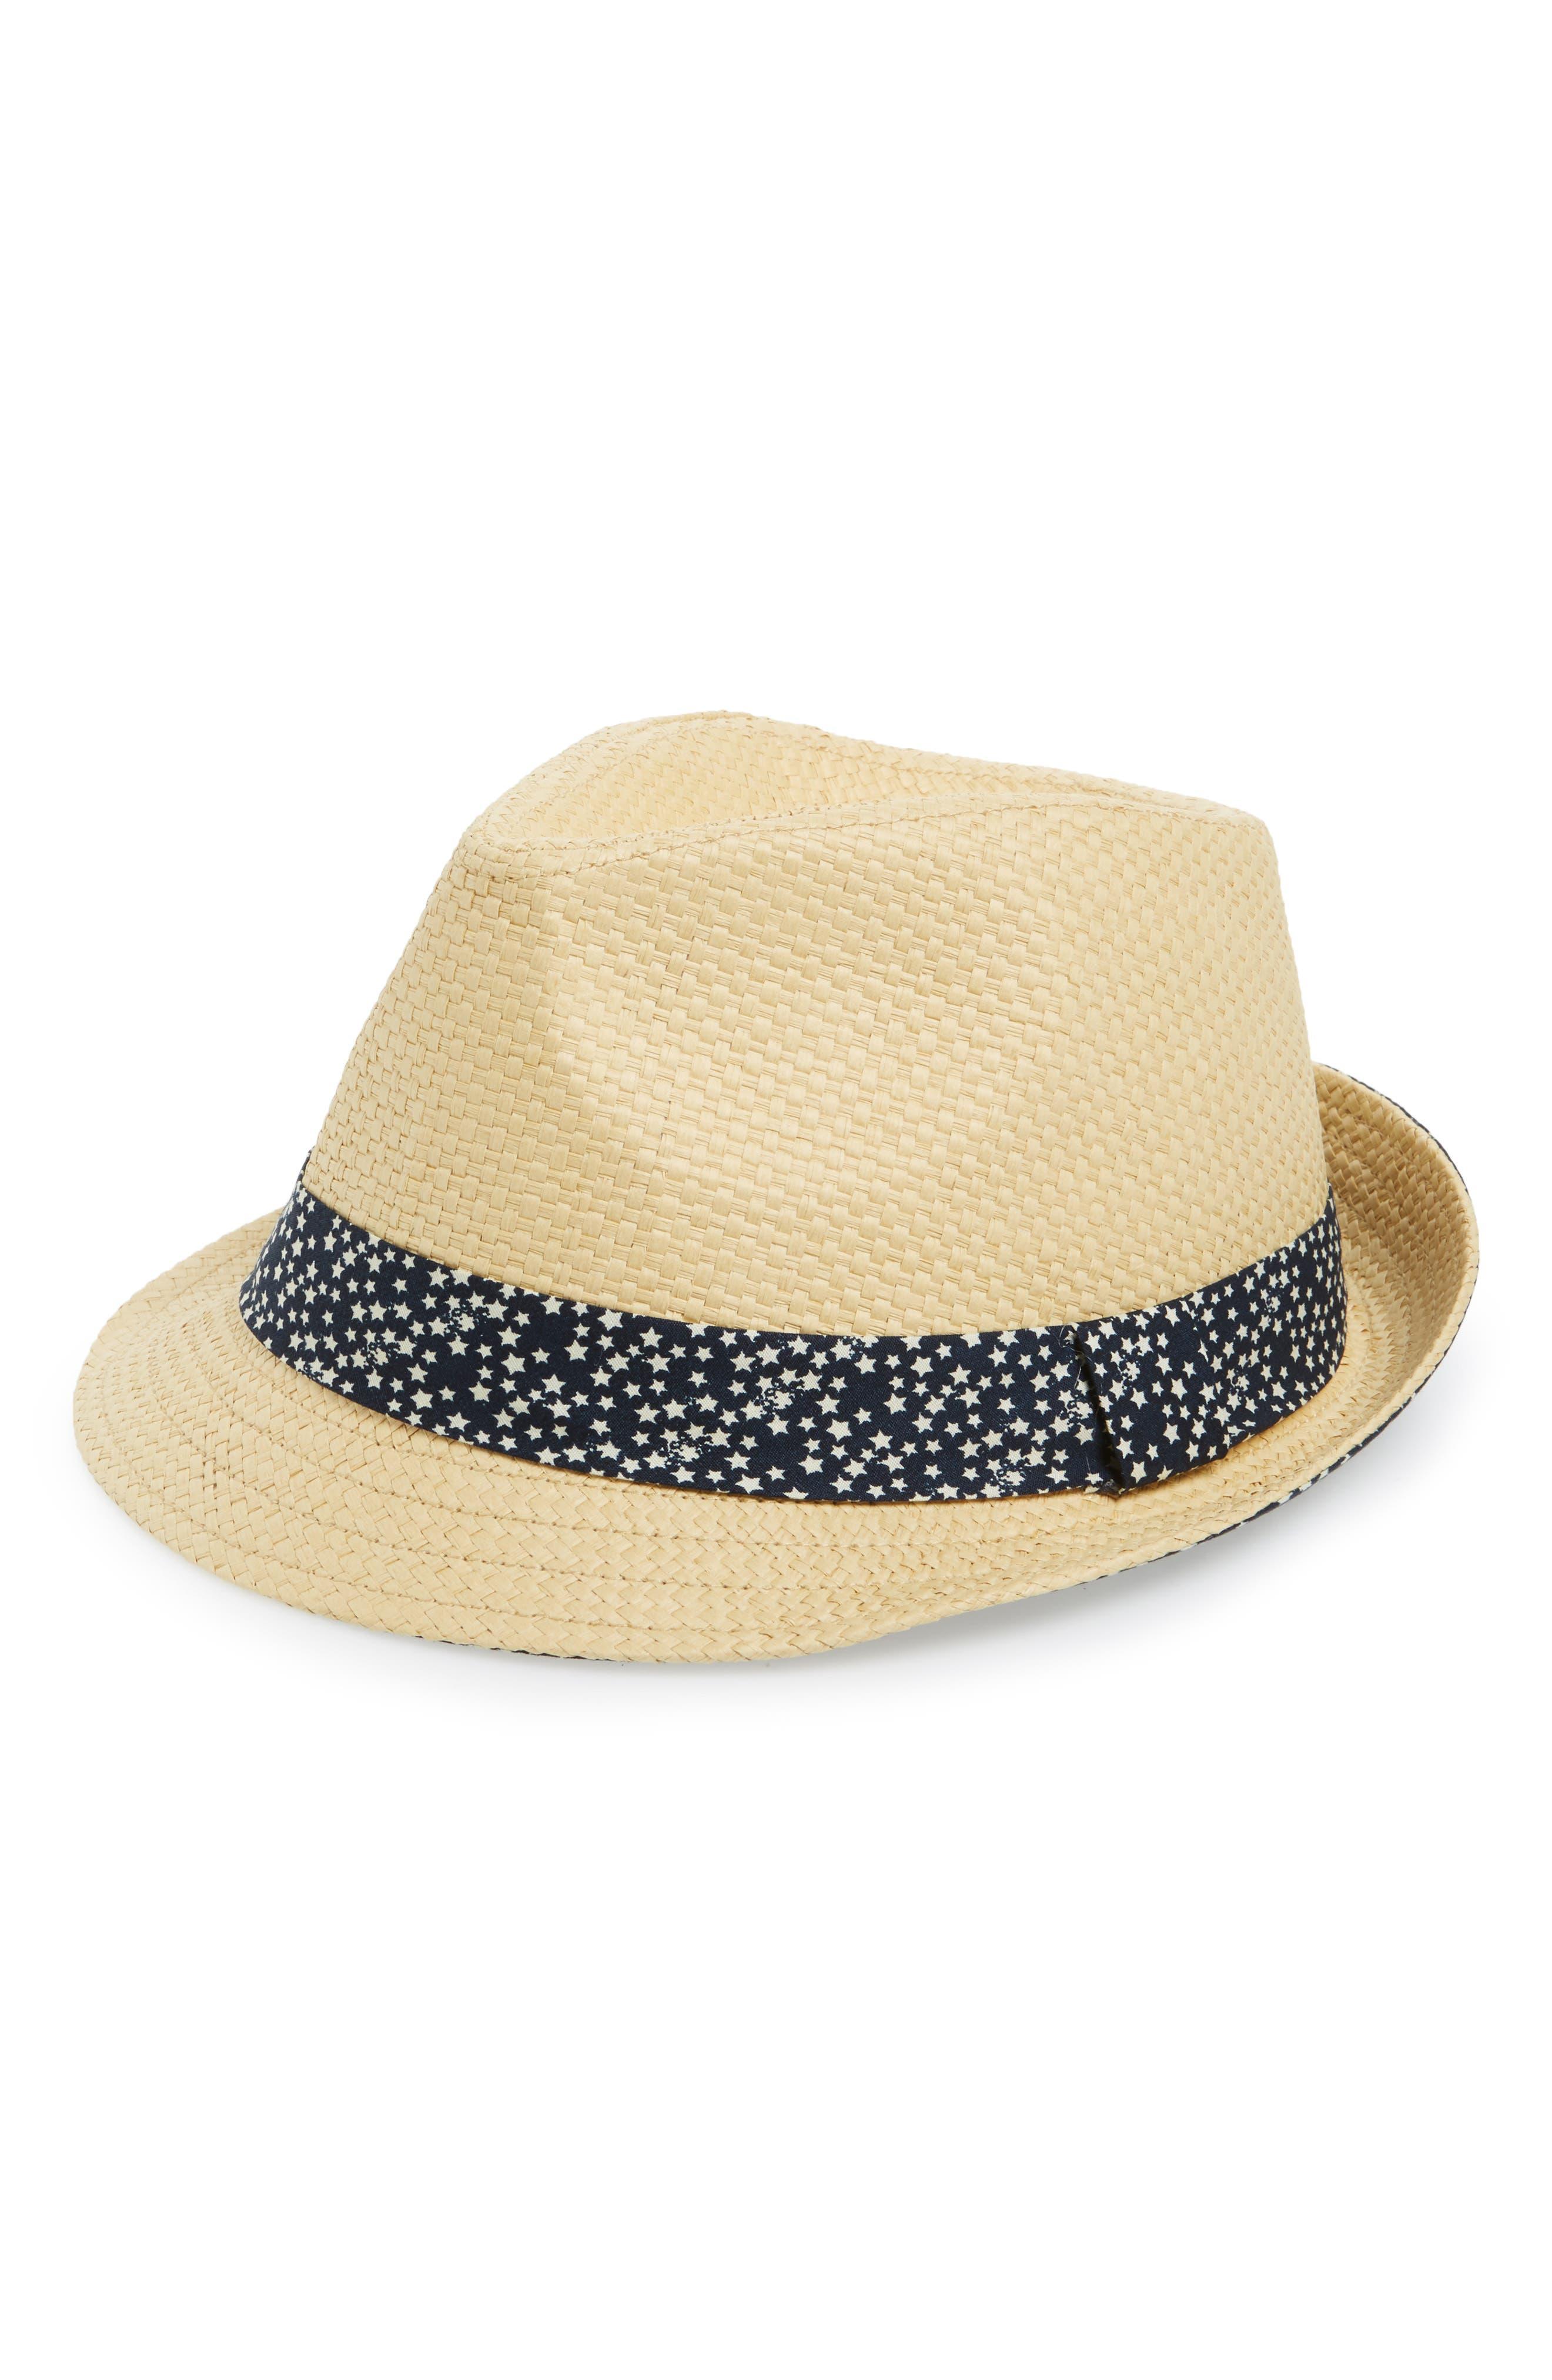 Emanuel Geraldo Print Band Straw Fedora Hat